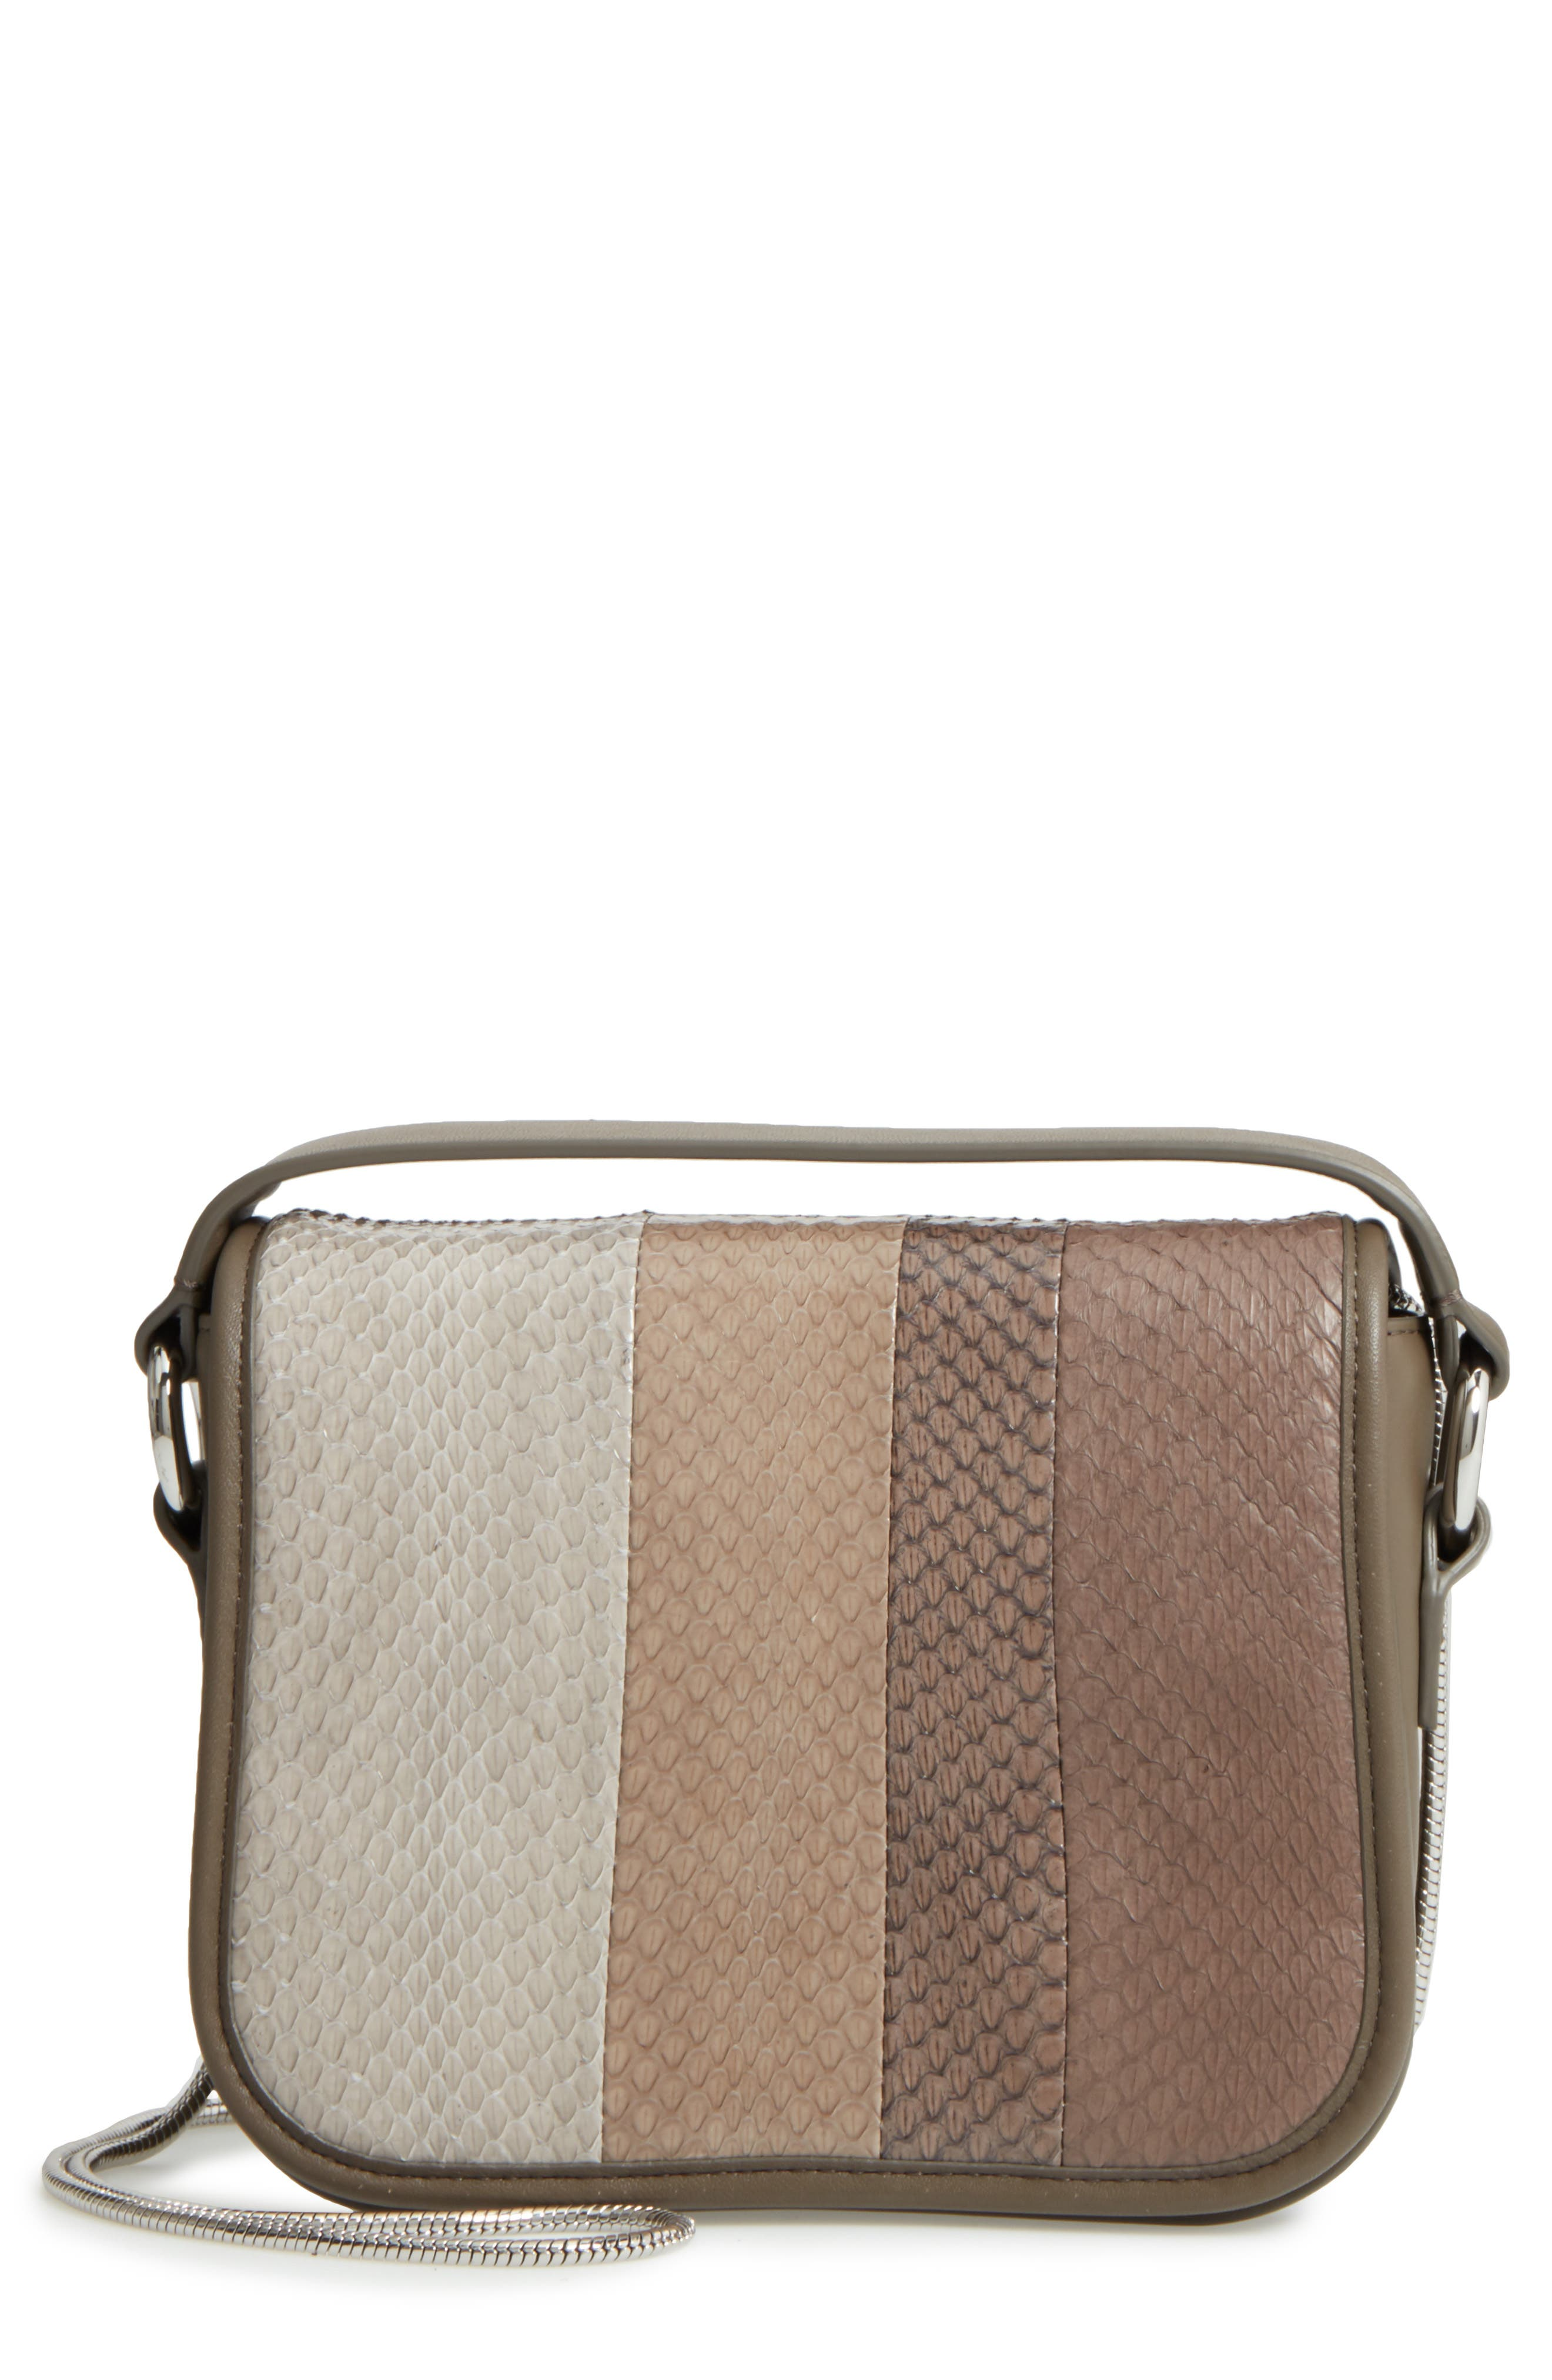 Main Image - ALLSAINTS Ikuya Leather & Genuine Snakeskin Clutch